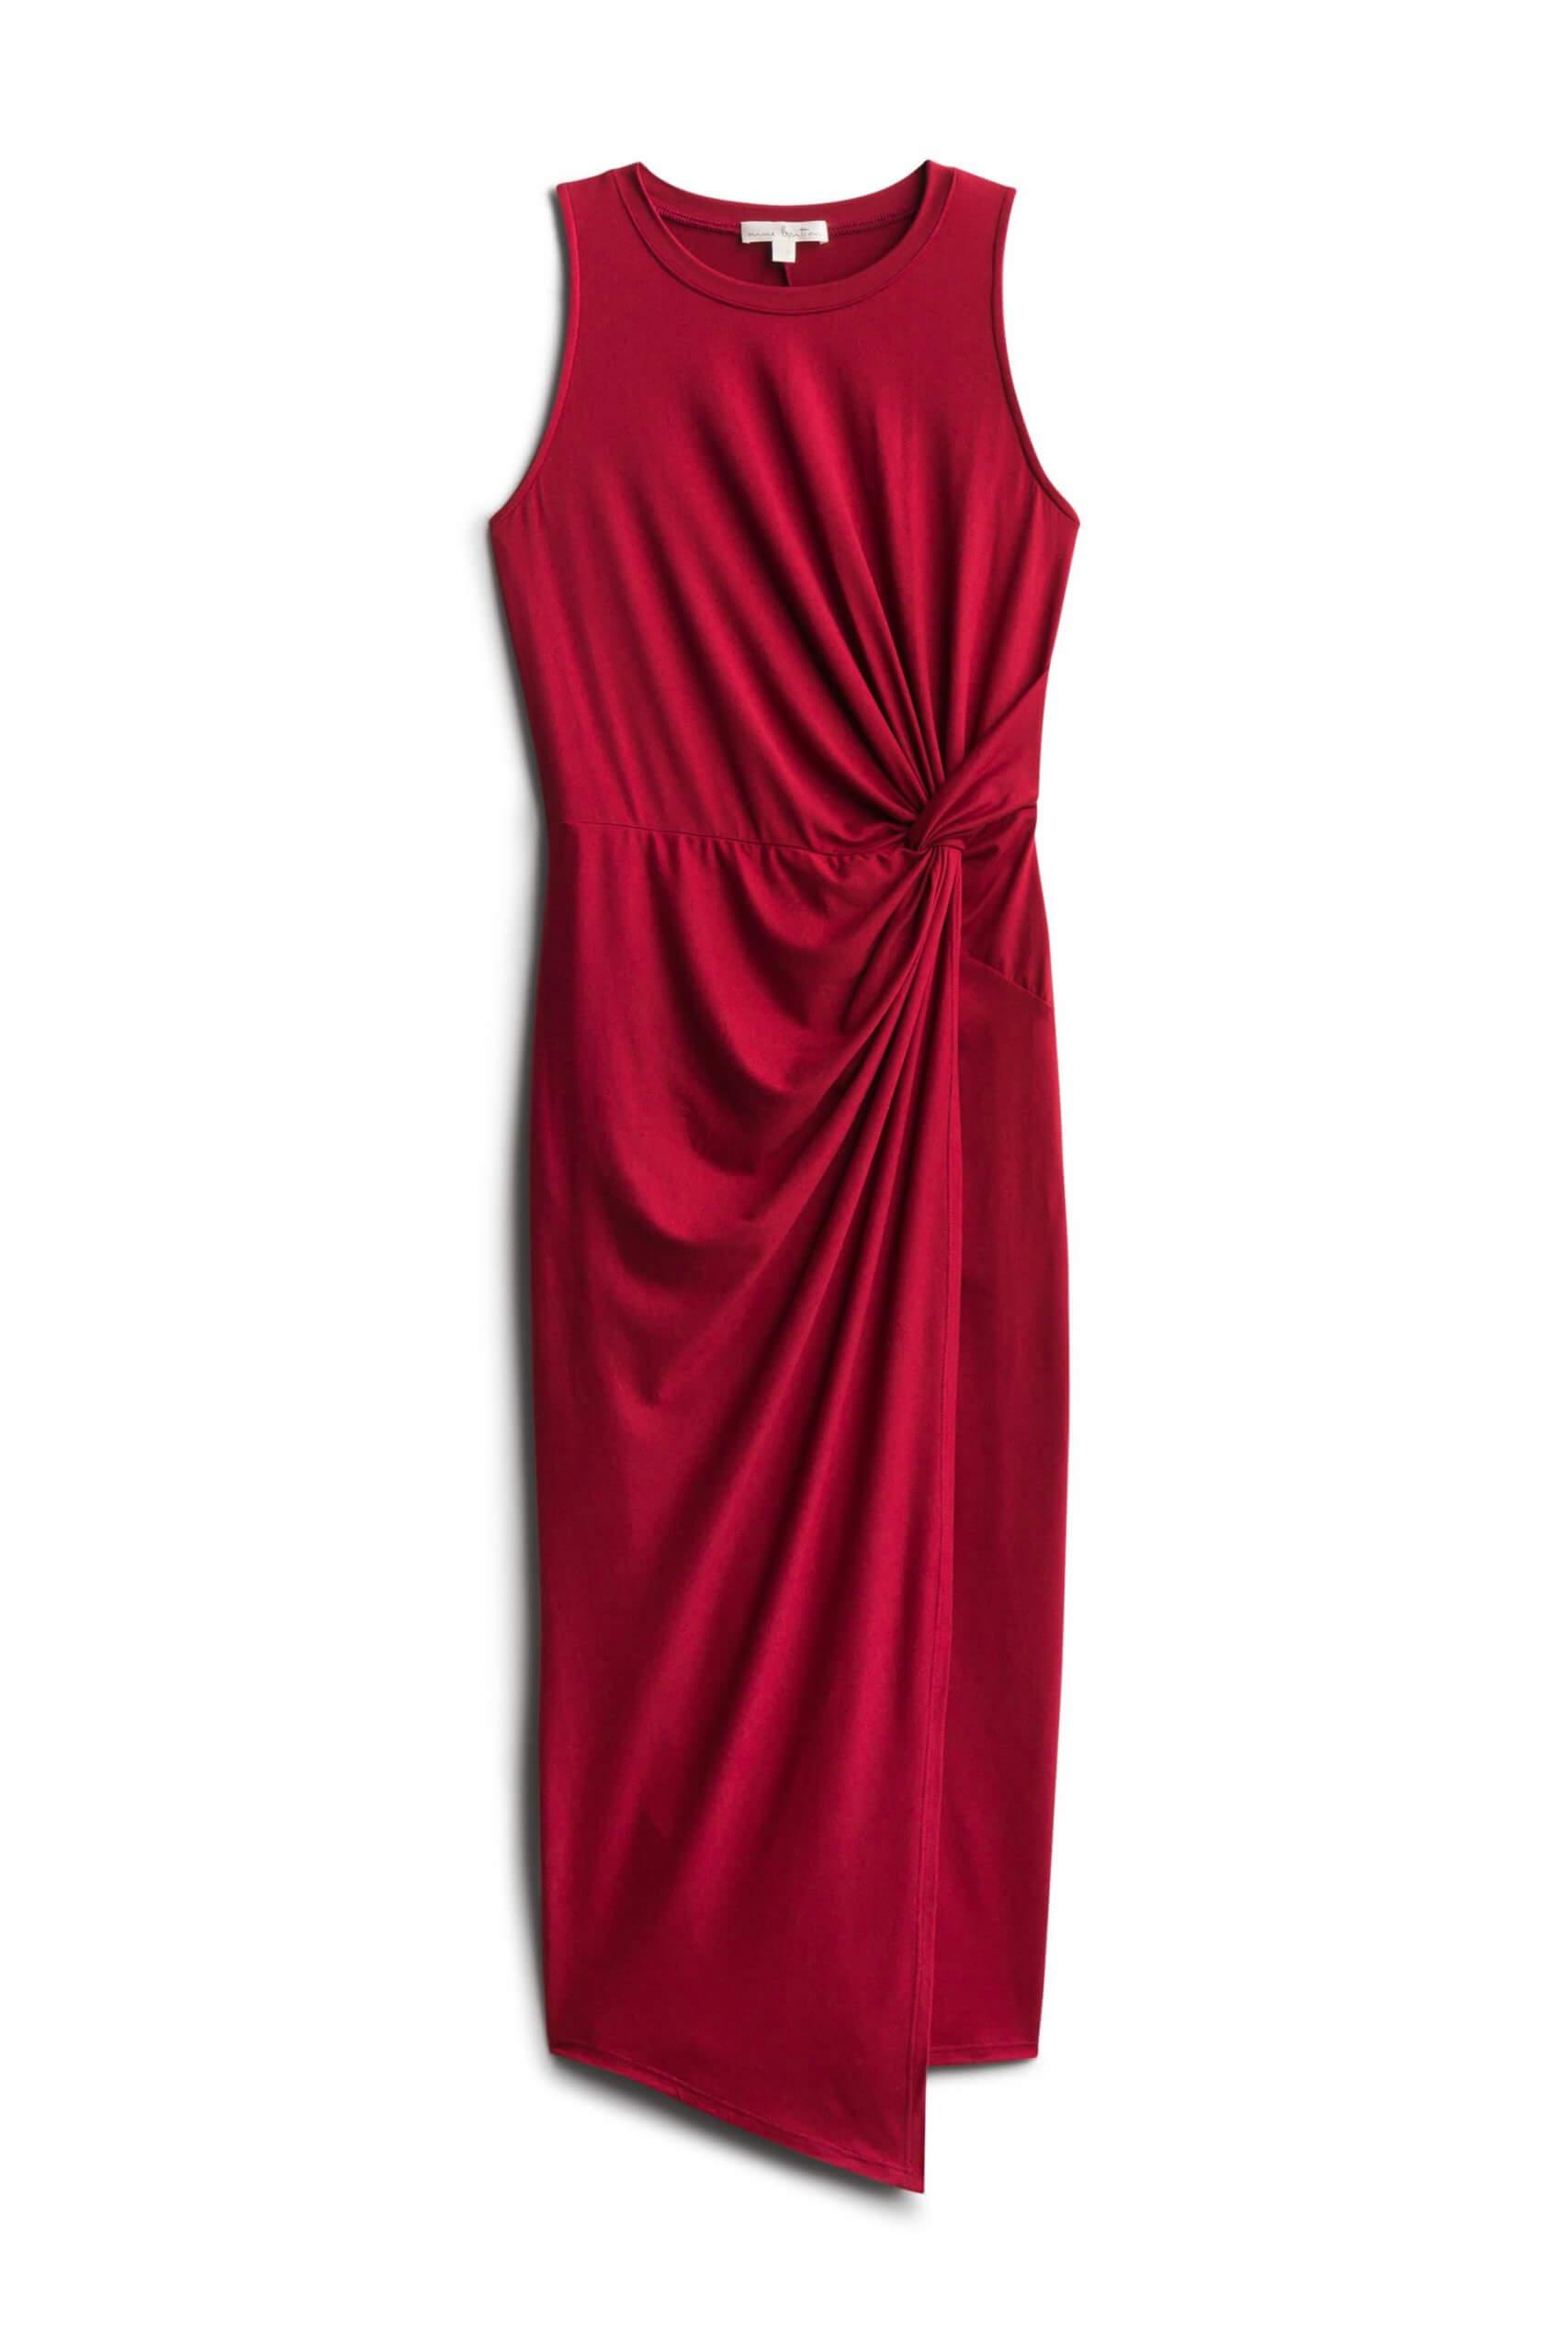 Stitch Fix Women's burgundy midi dress.